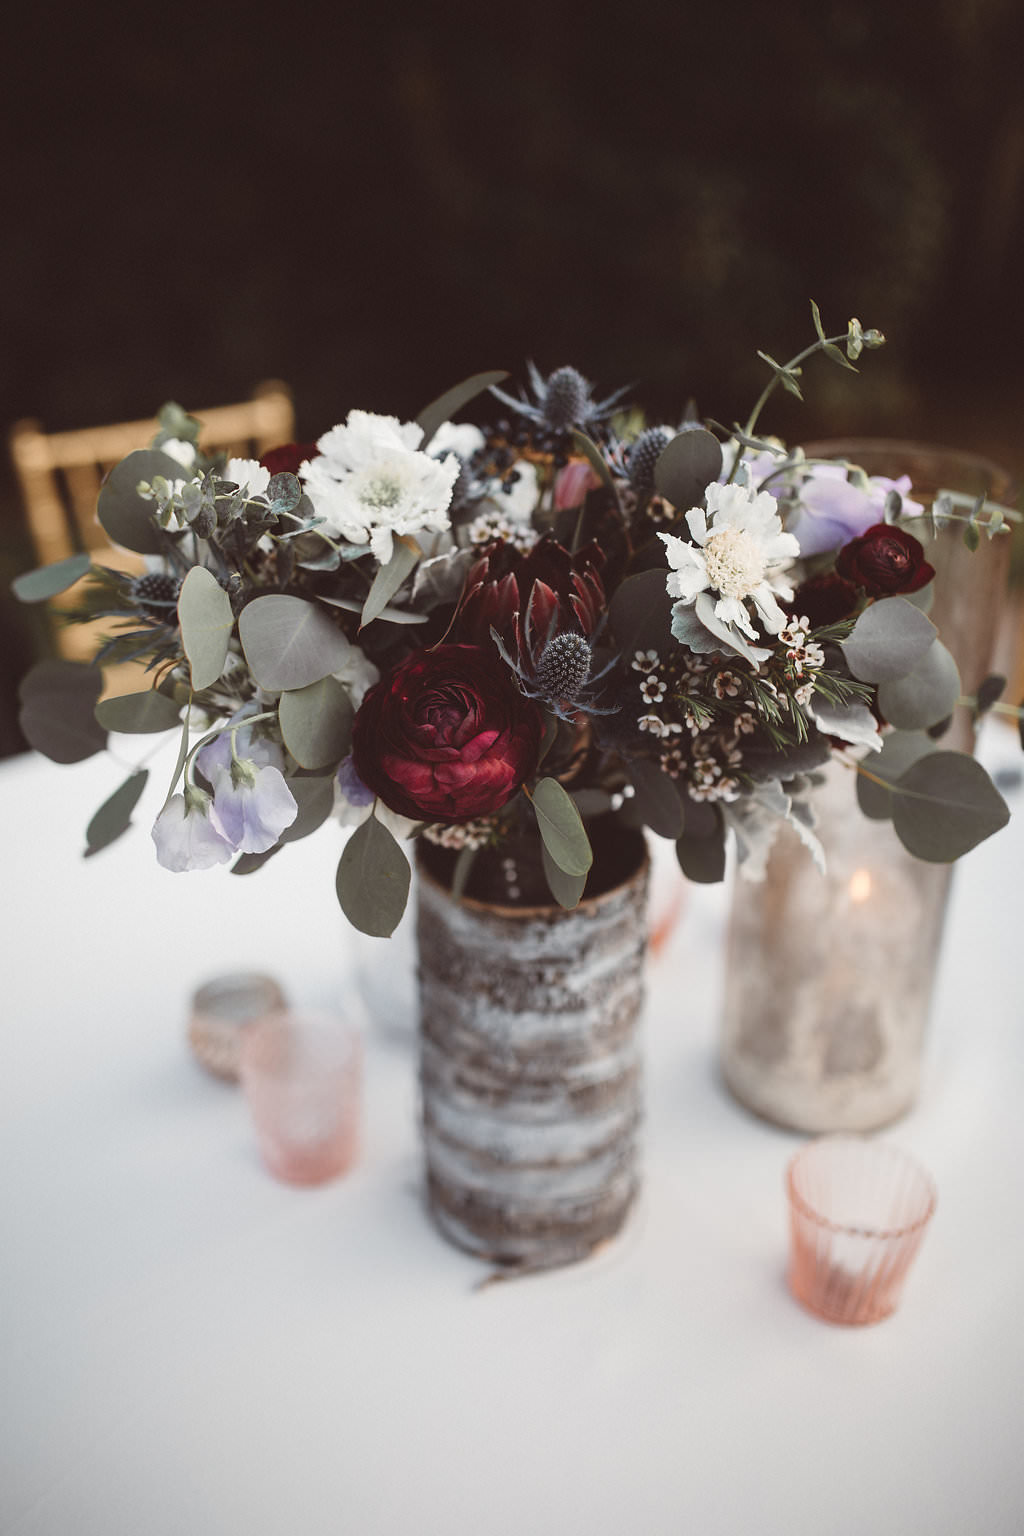 Table Flowers Centrepiece Candles Decor Charleston Wedding Katherine Dalton Photography